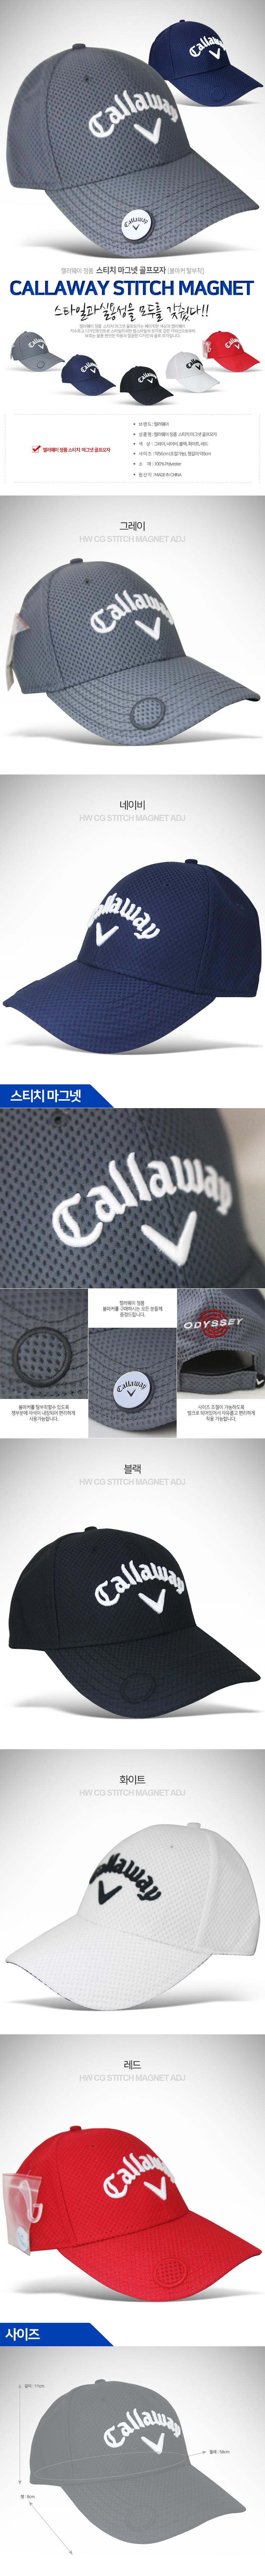 callaway_stitchmagnet_cap.jpg